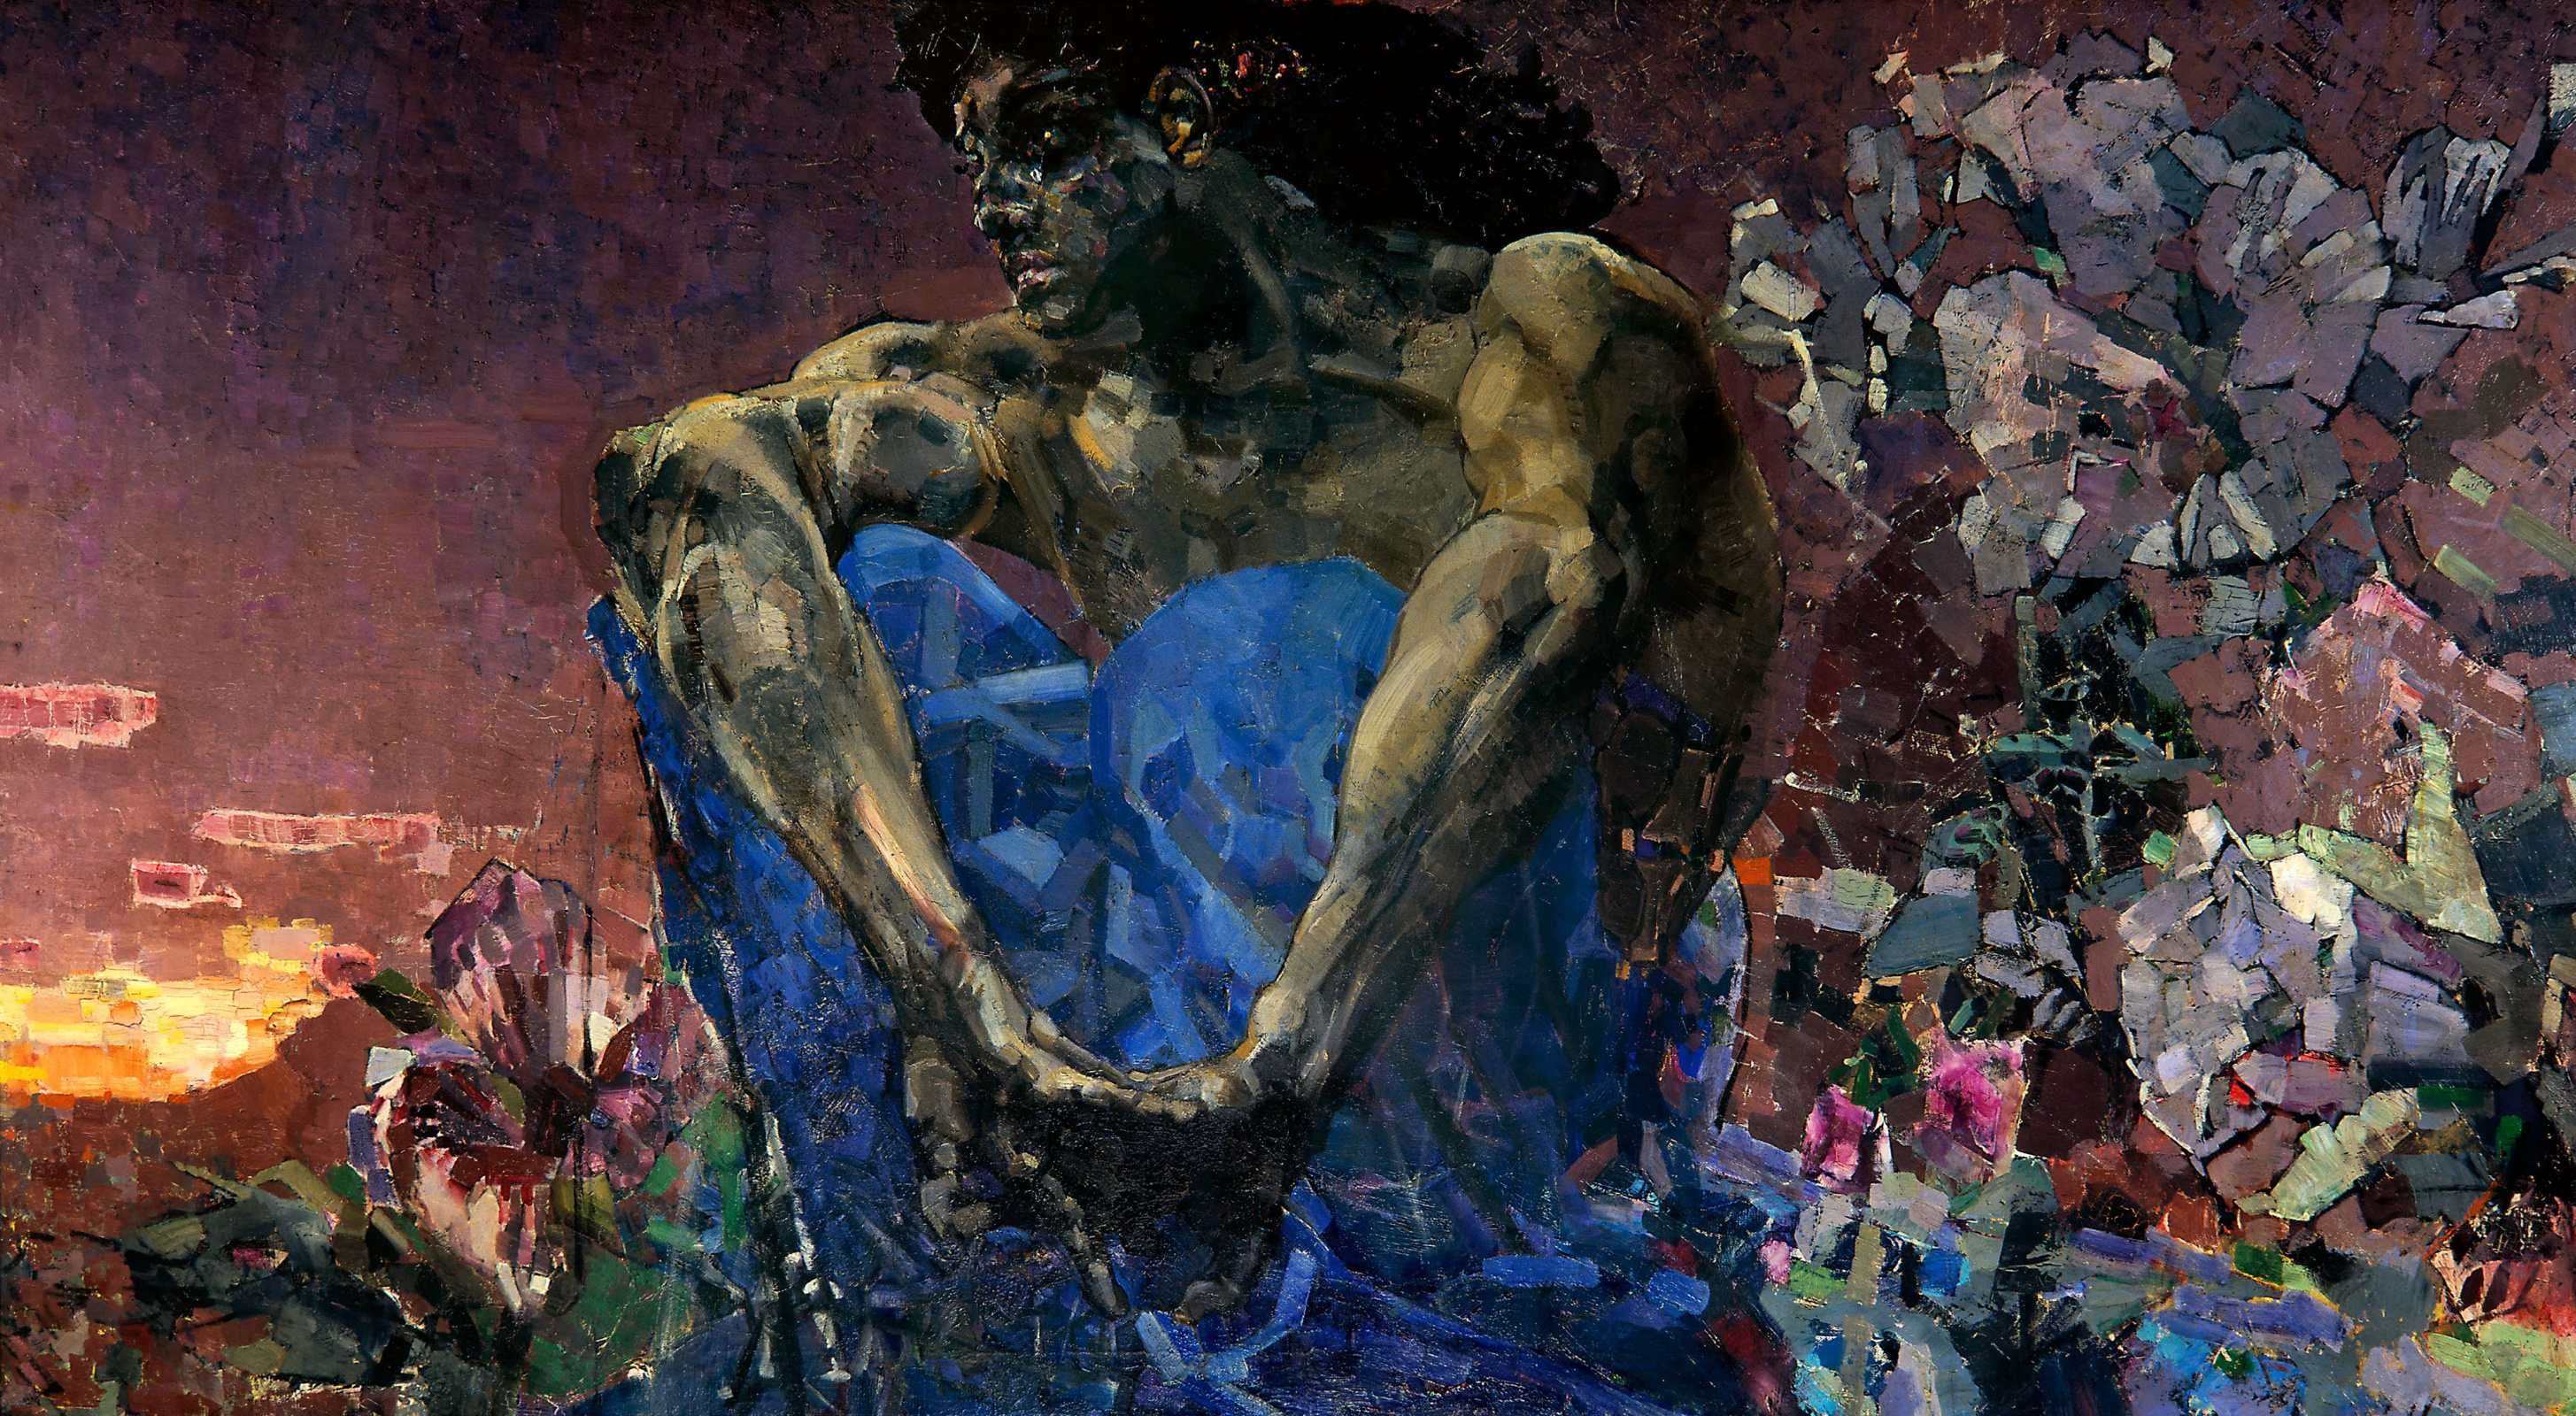 Михаил Александрович Врубель. Демон сидящий